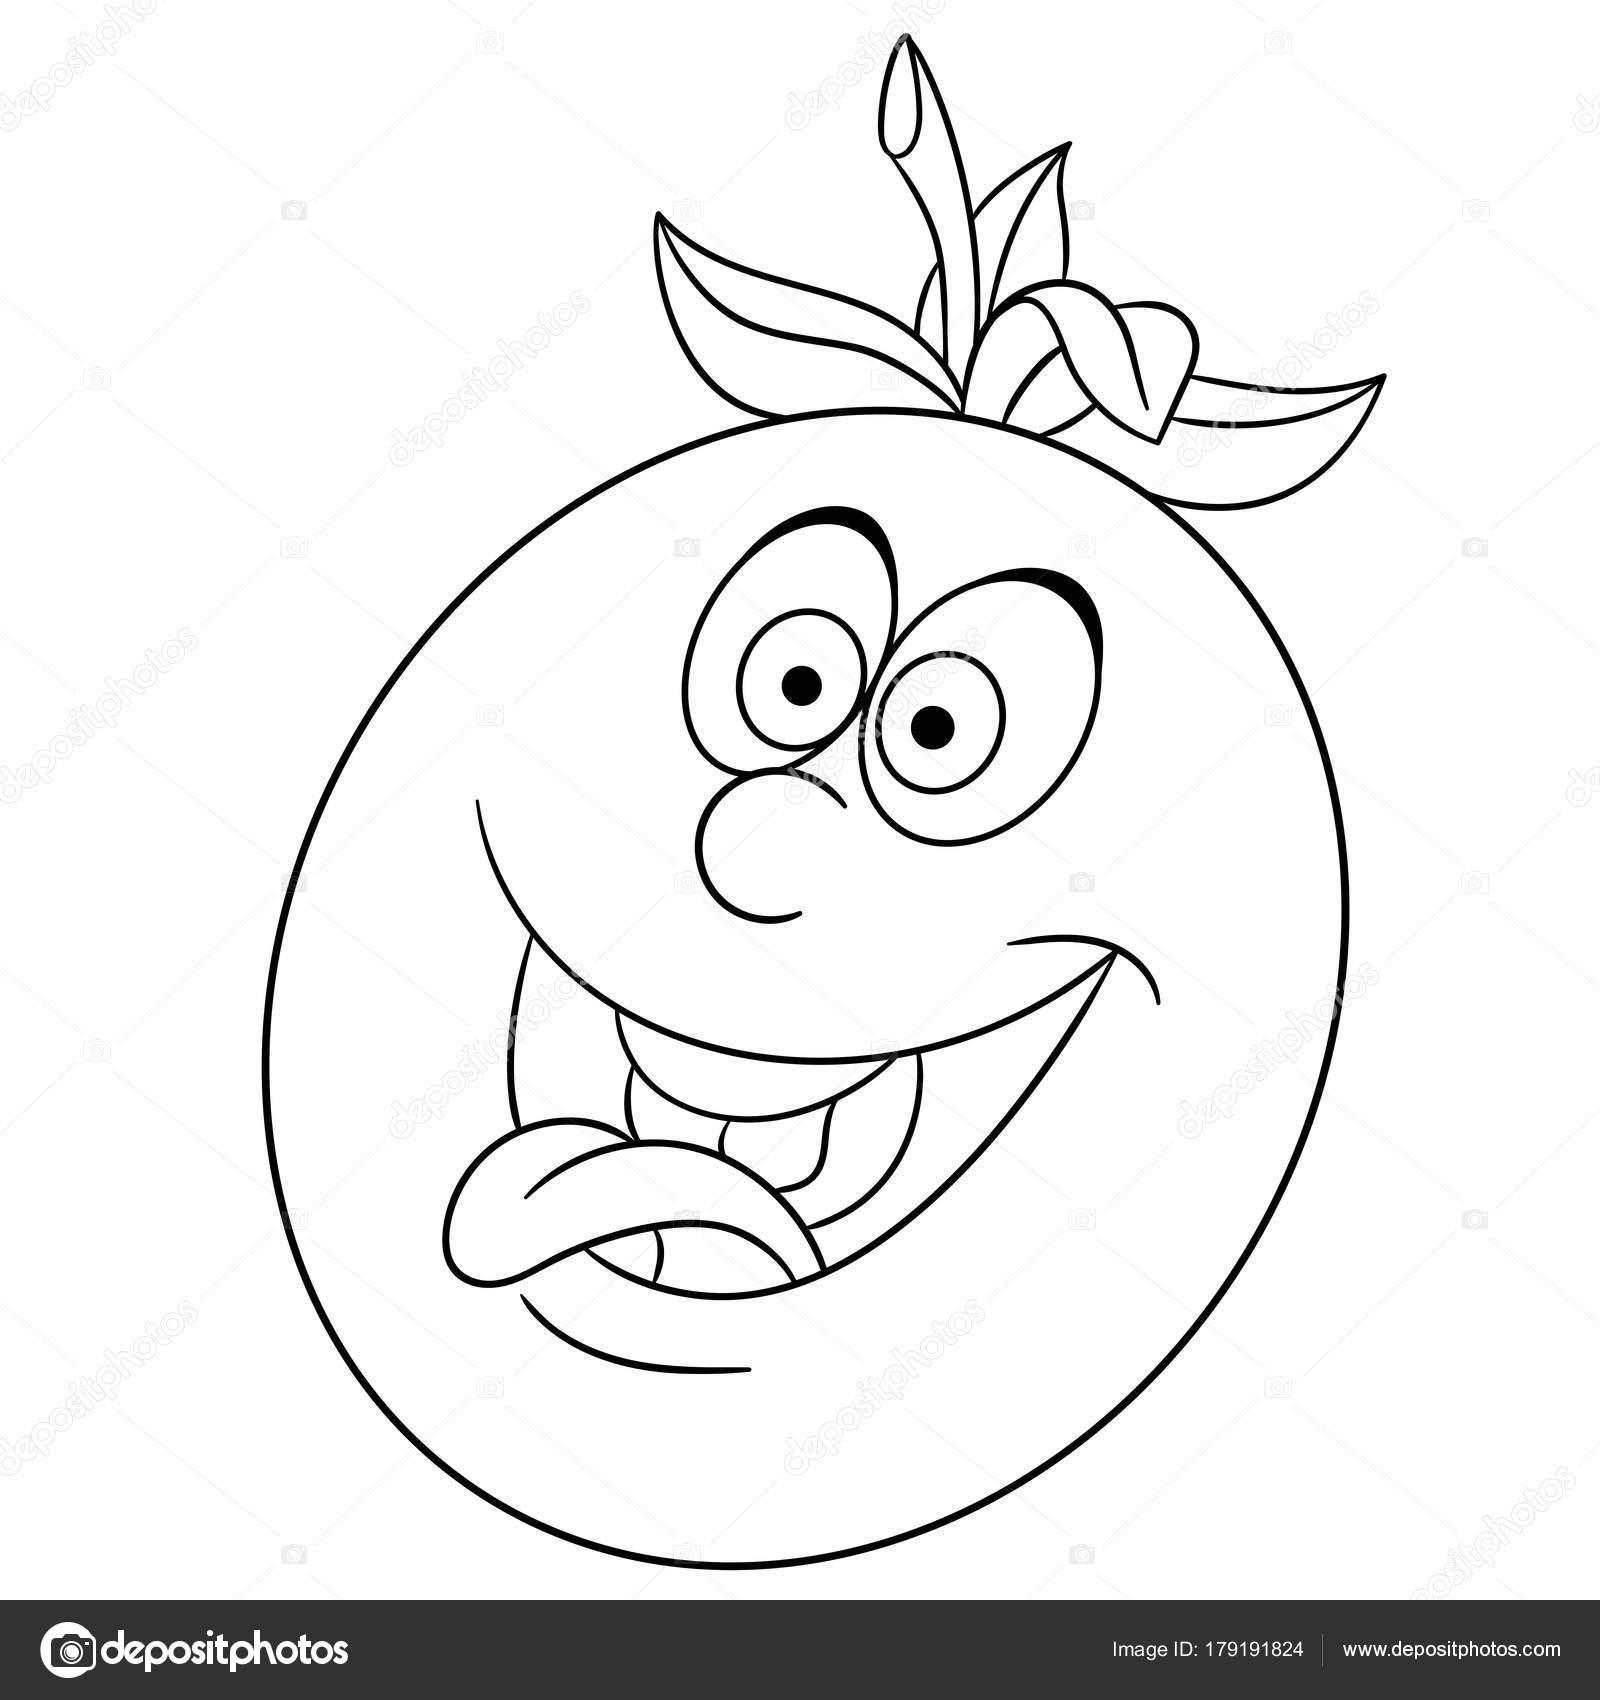 Libro Colorear Página Para Colorear Dibujos Animados Carácter Tomate ...